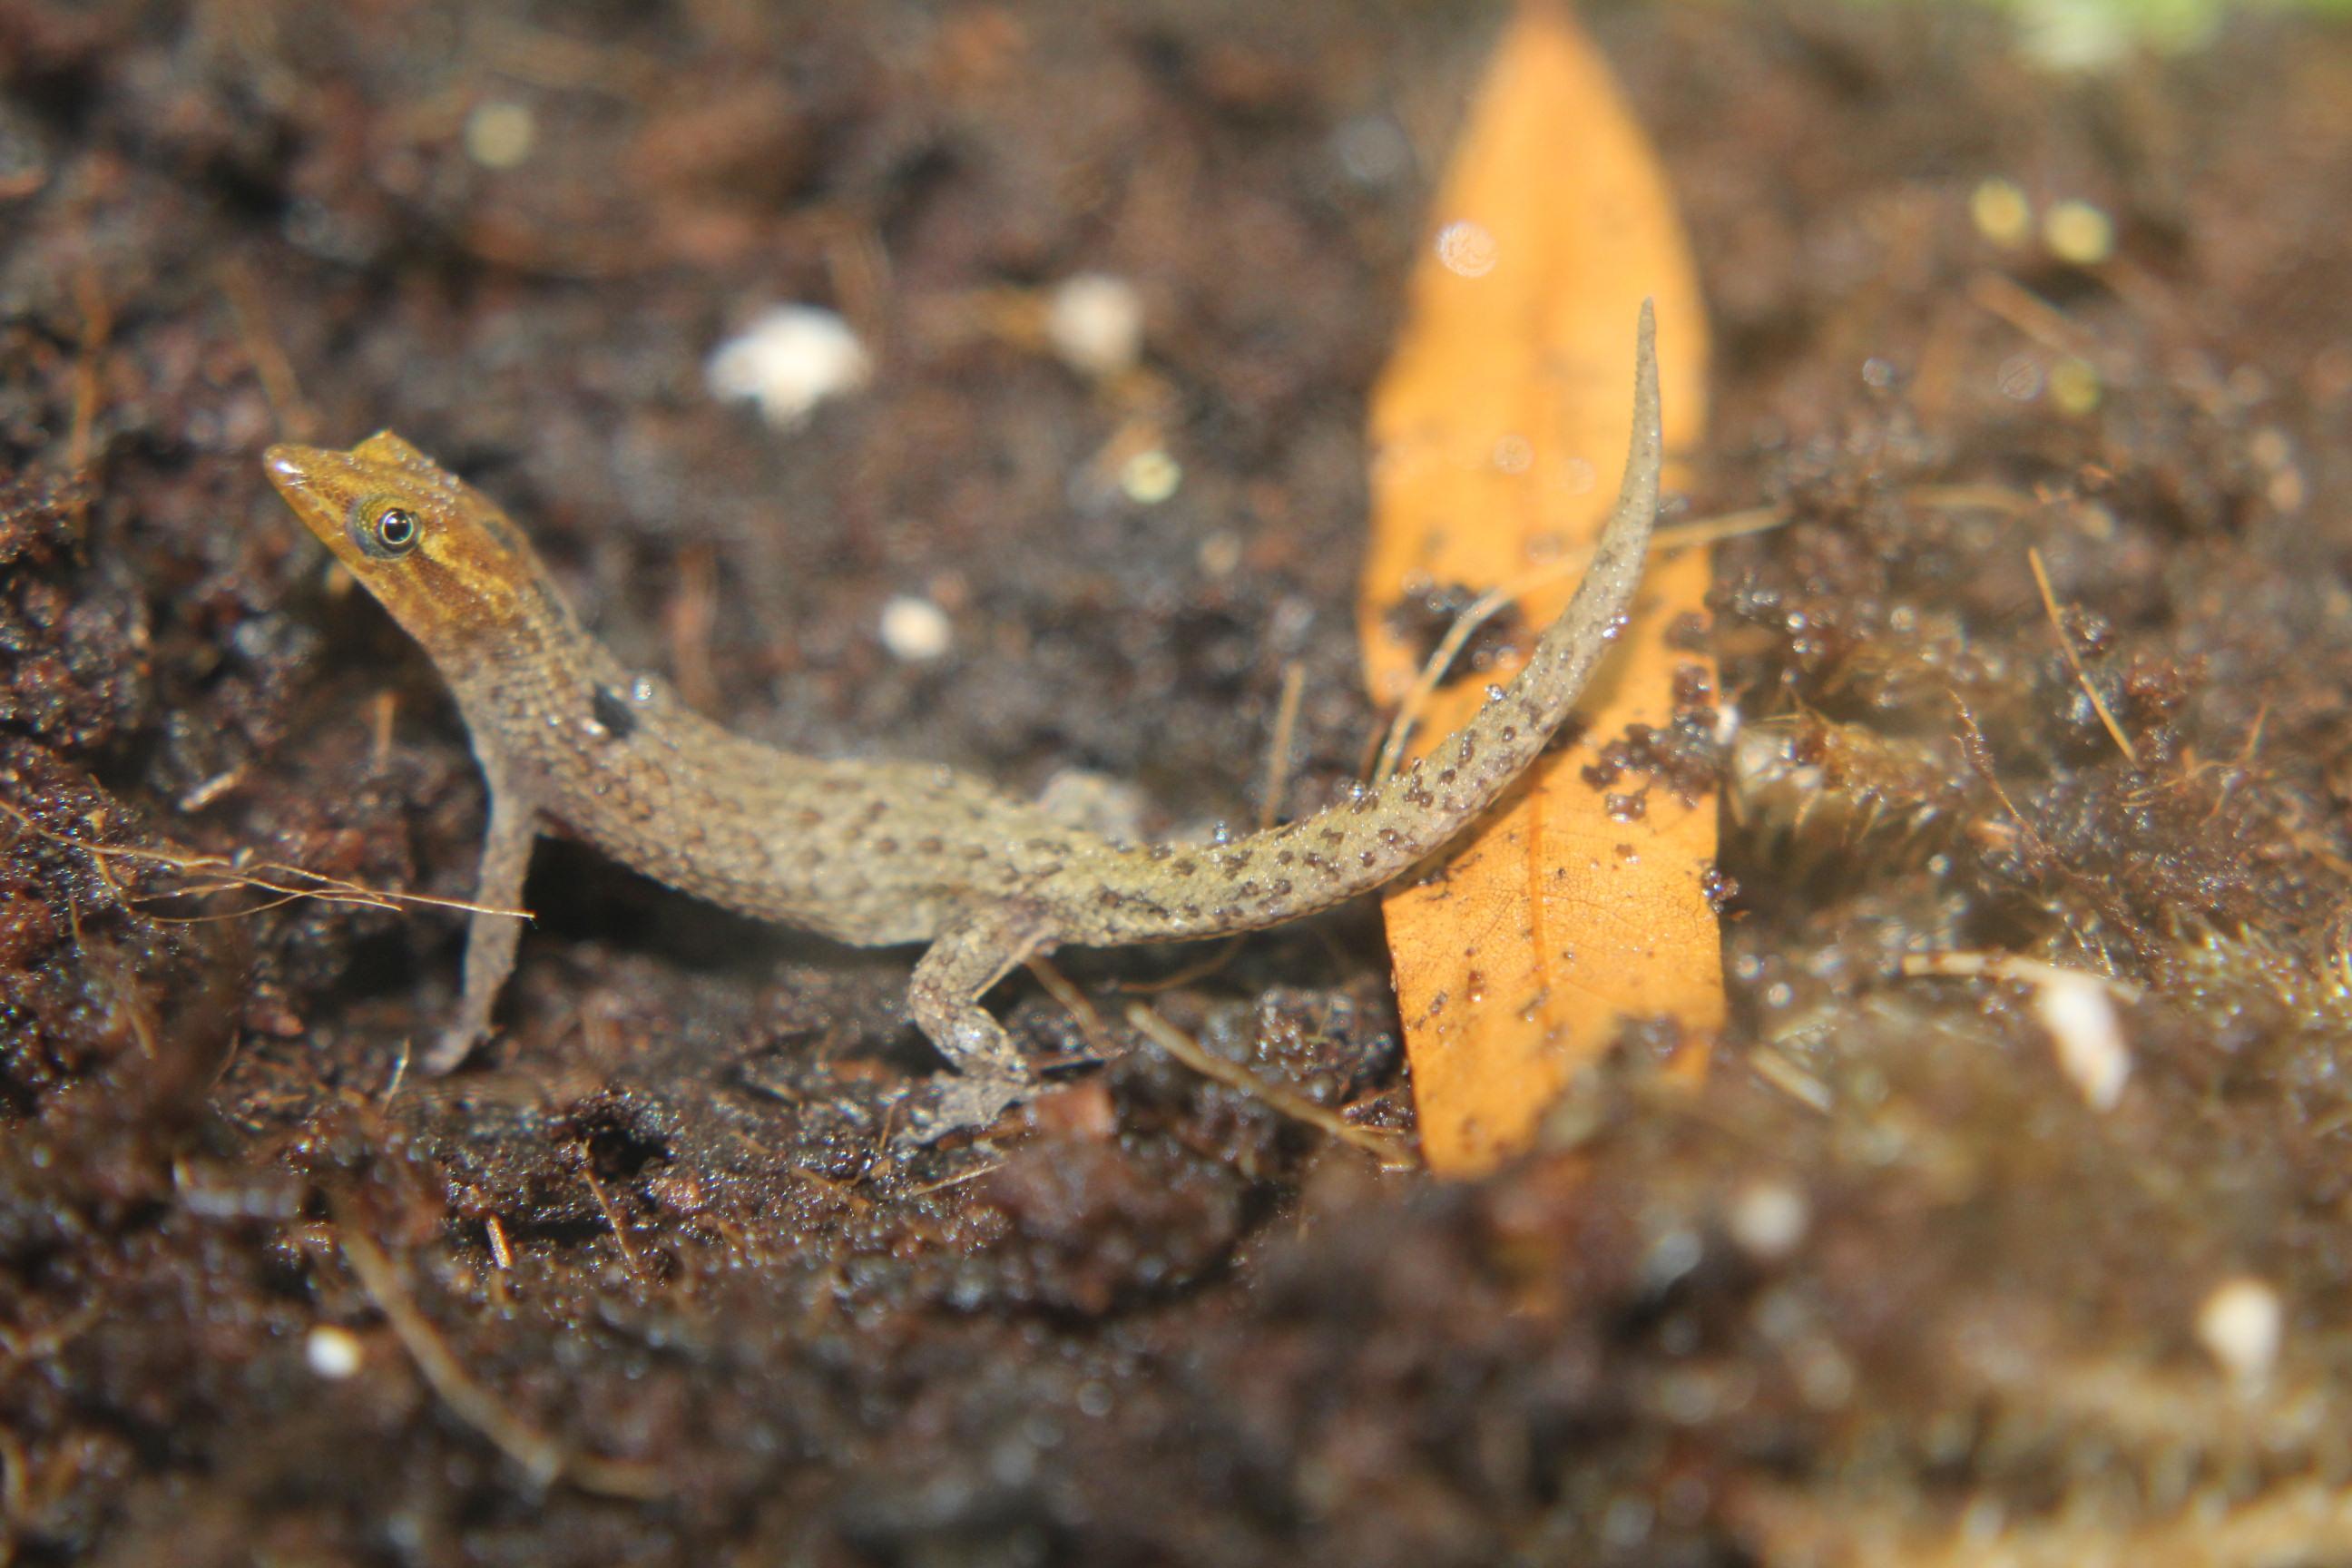 Sphaerodactylus macrolepis